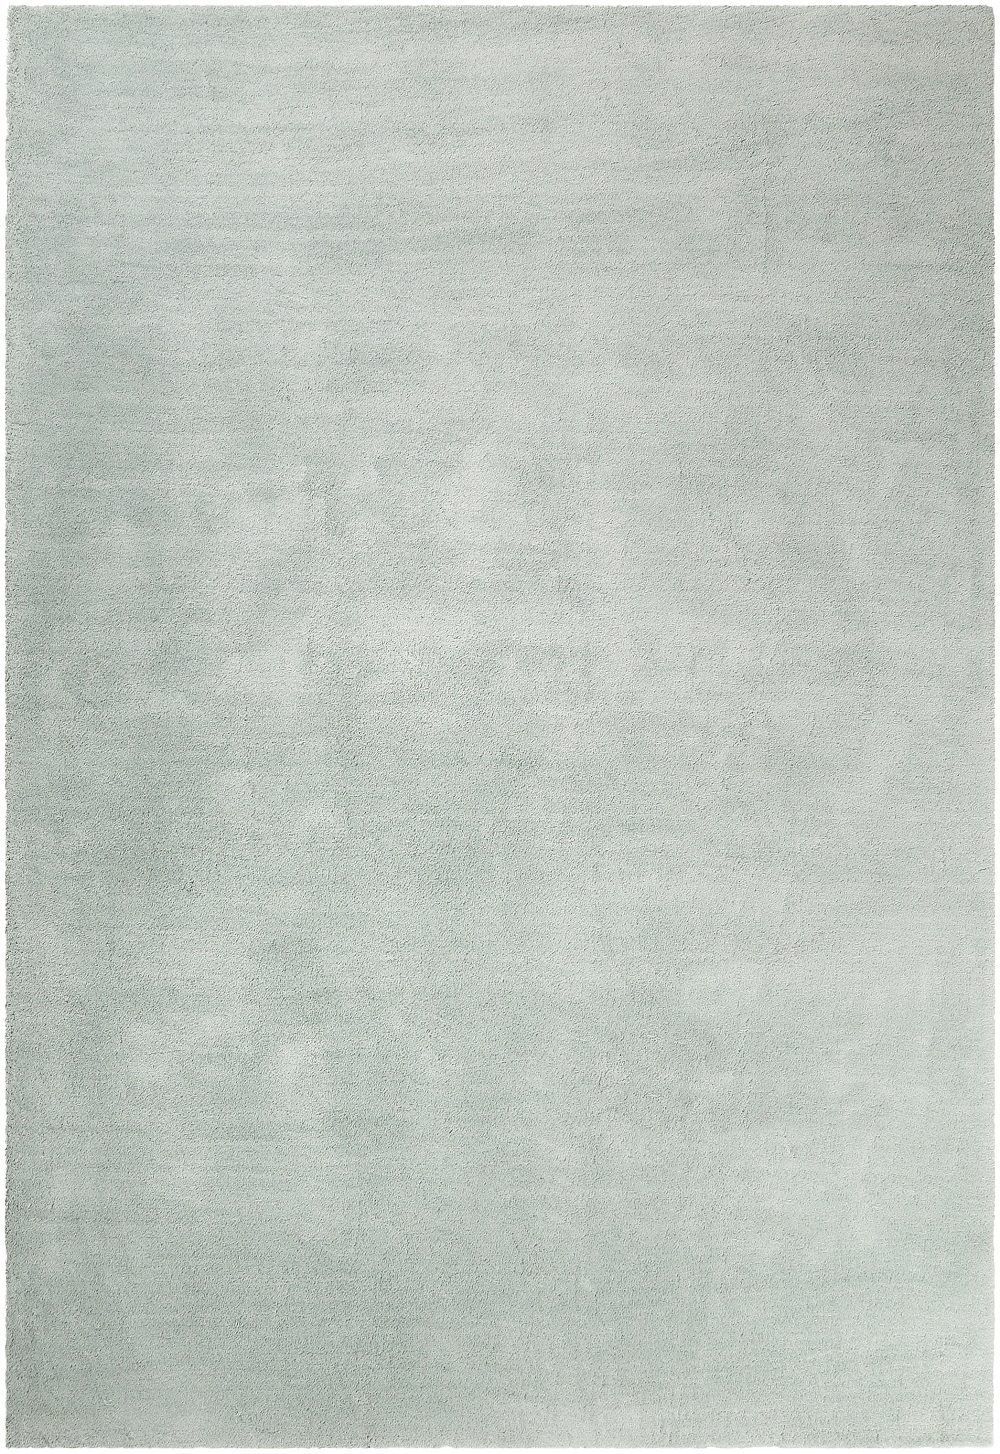 teppich esprit loft esp 4223 19 grau gr n raum quadrat. Black Bedroom Furniture Sets. Home Design Ideas